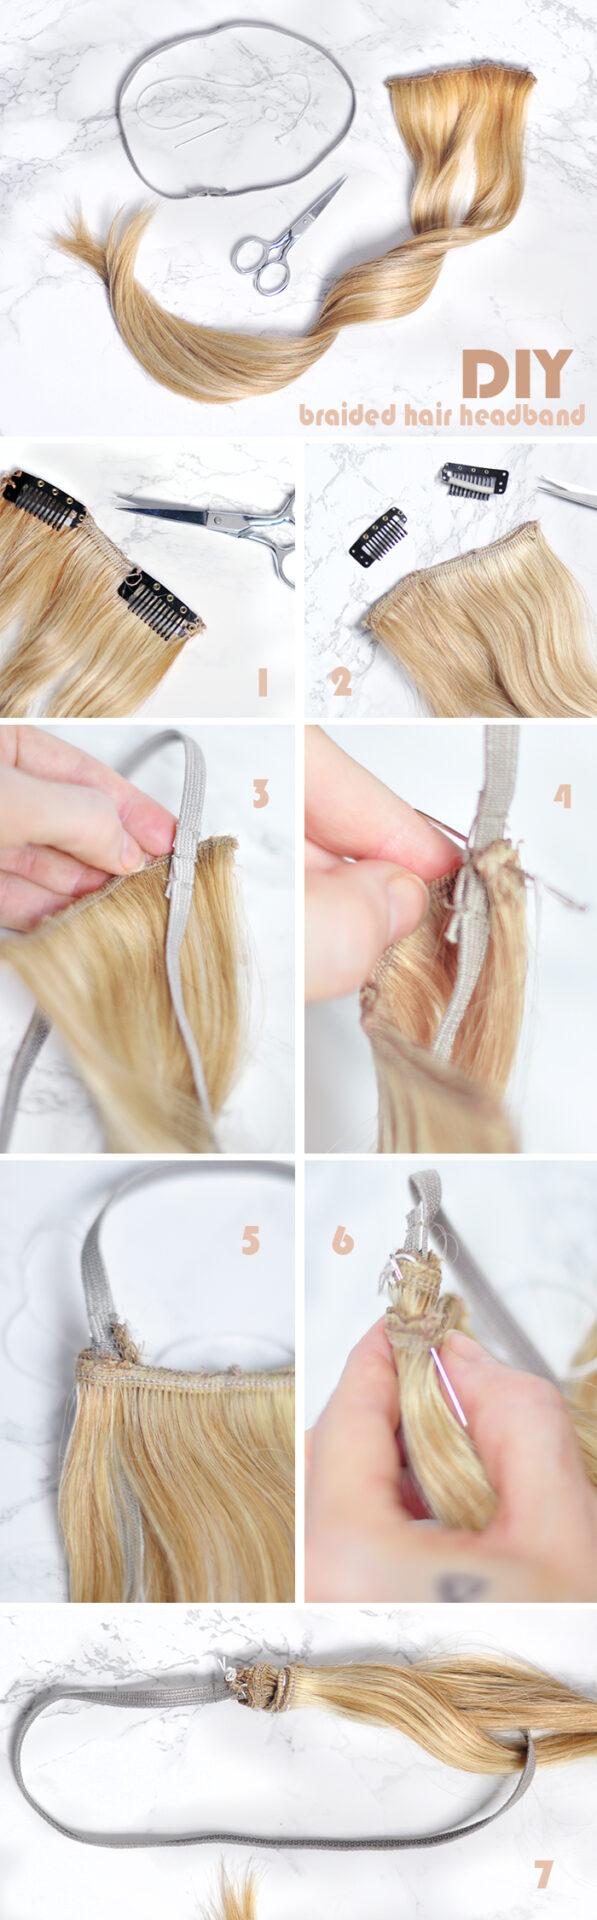 DIY Braided Hair Headband Tutorial